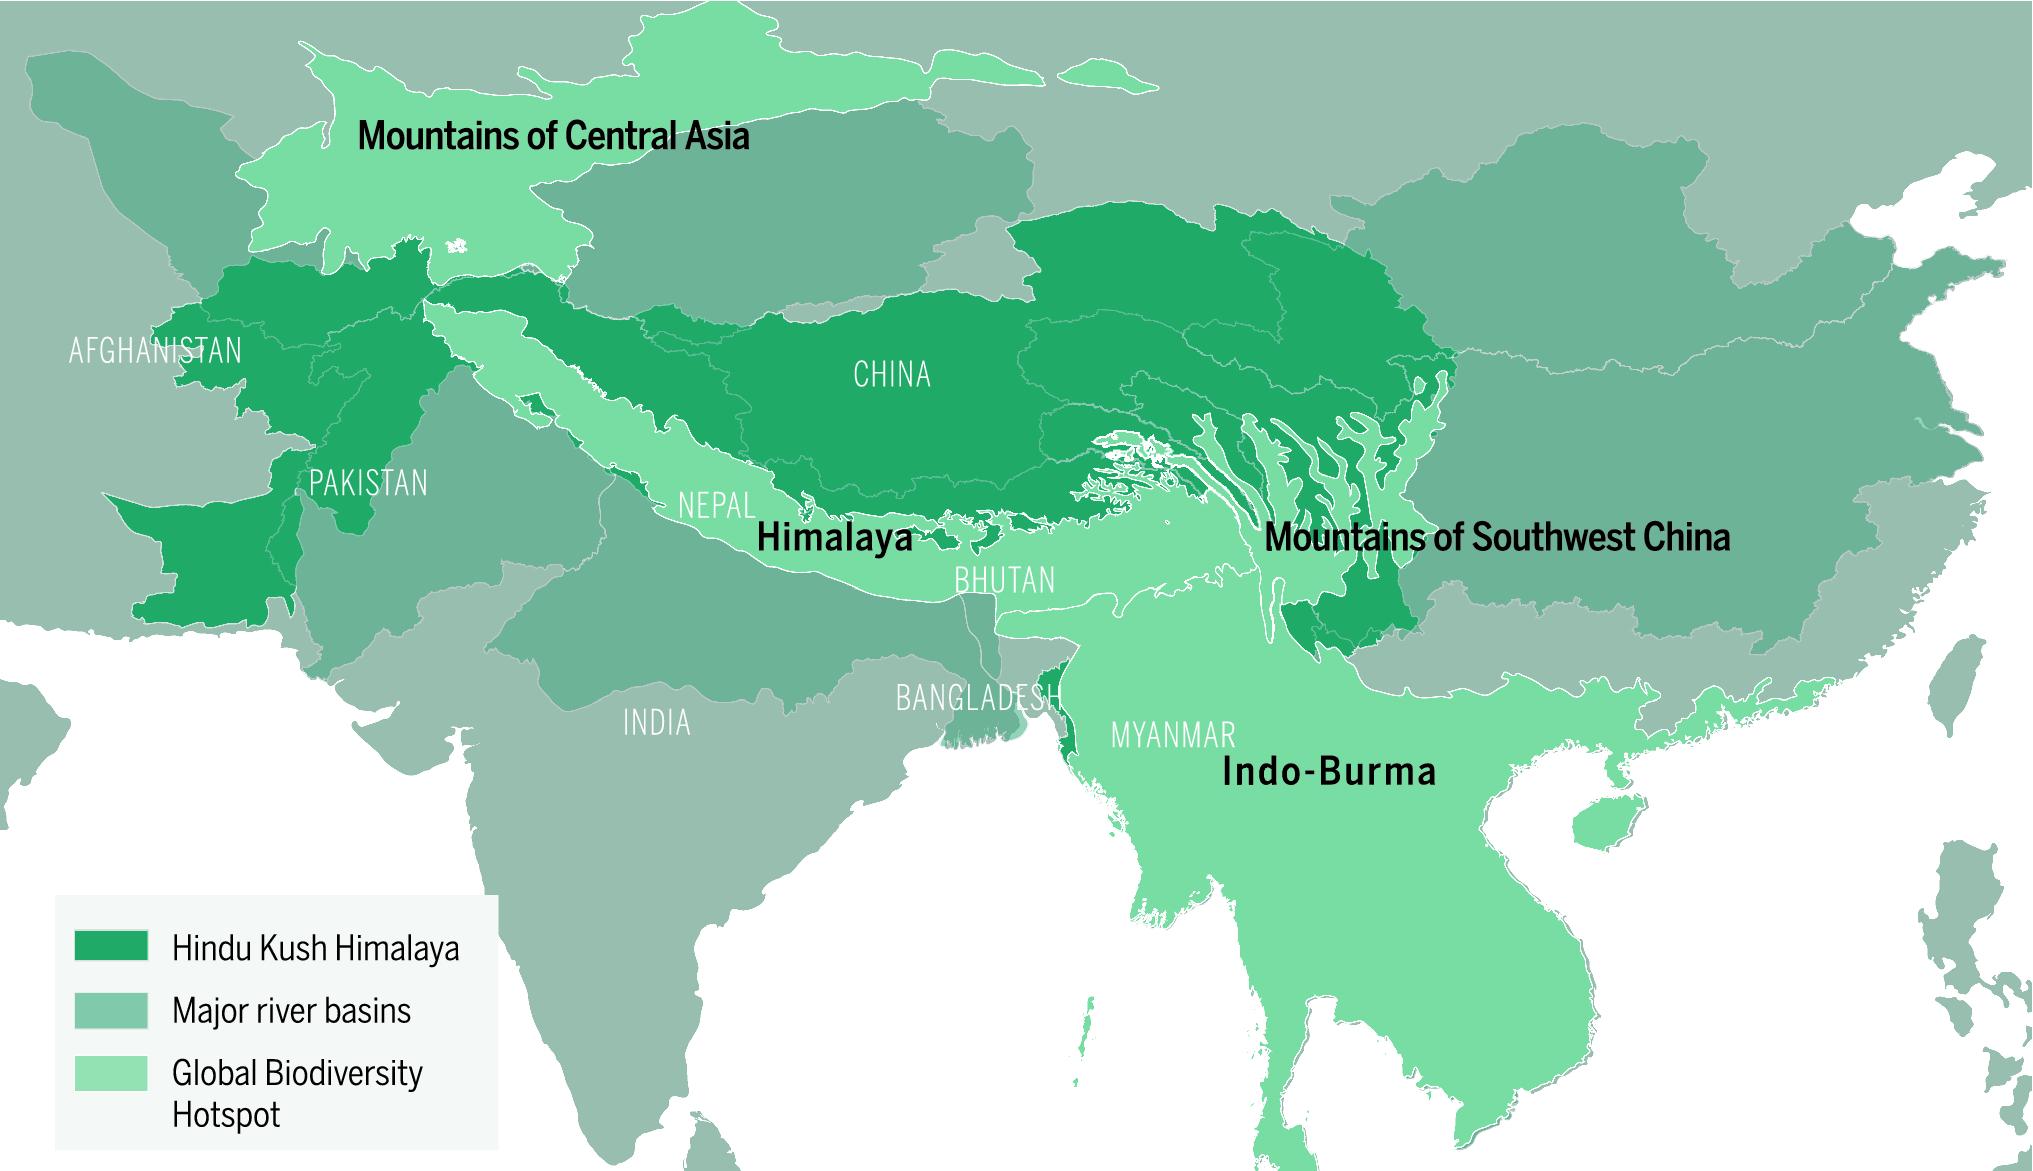 Sustaining Biodiversity and Ecosystem Services in the Hindu Kush